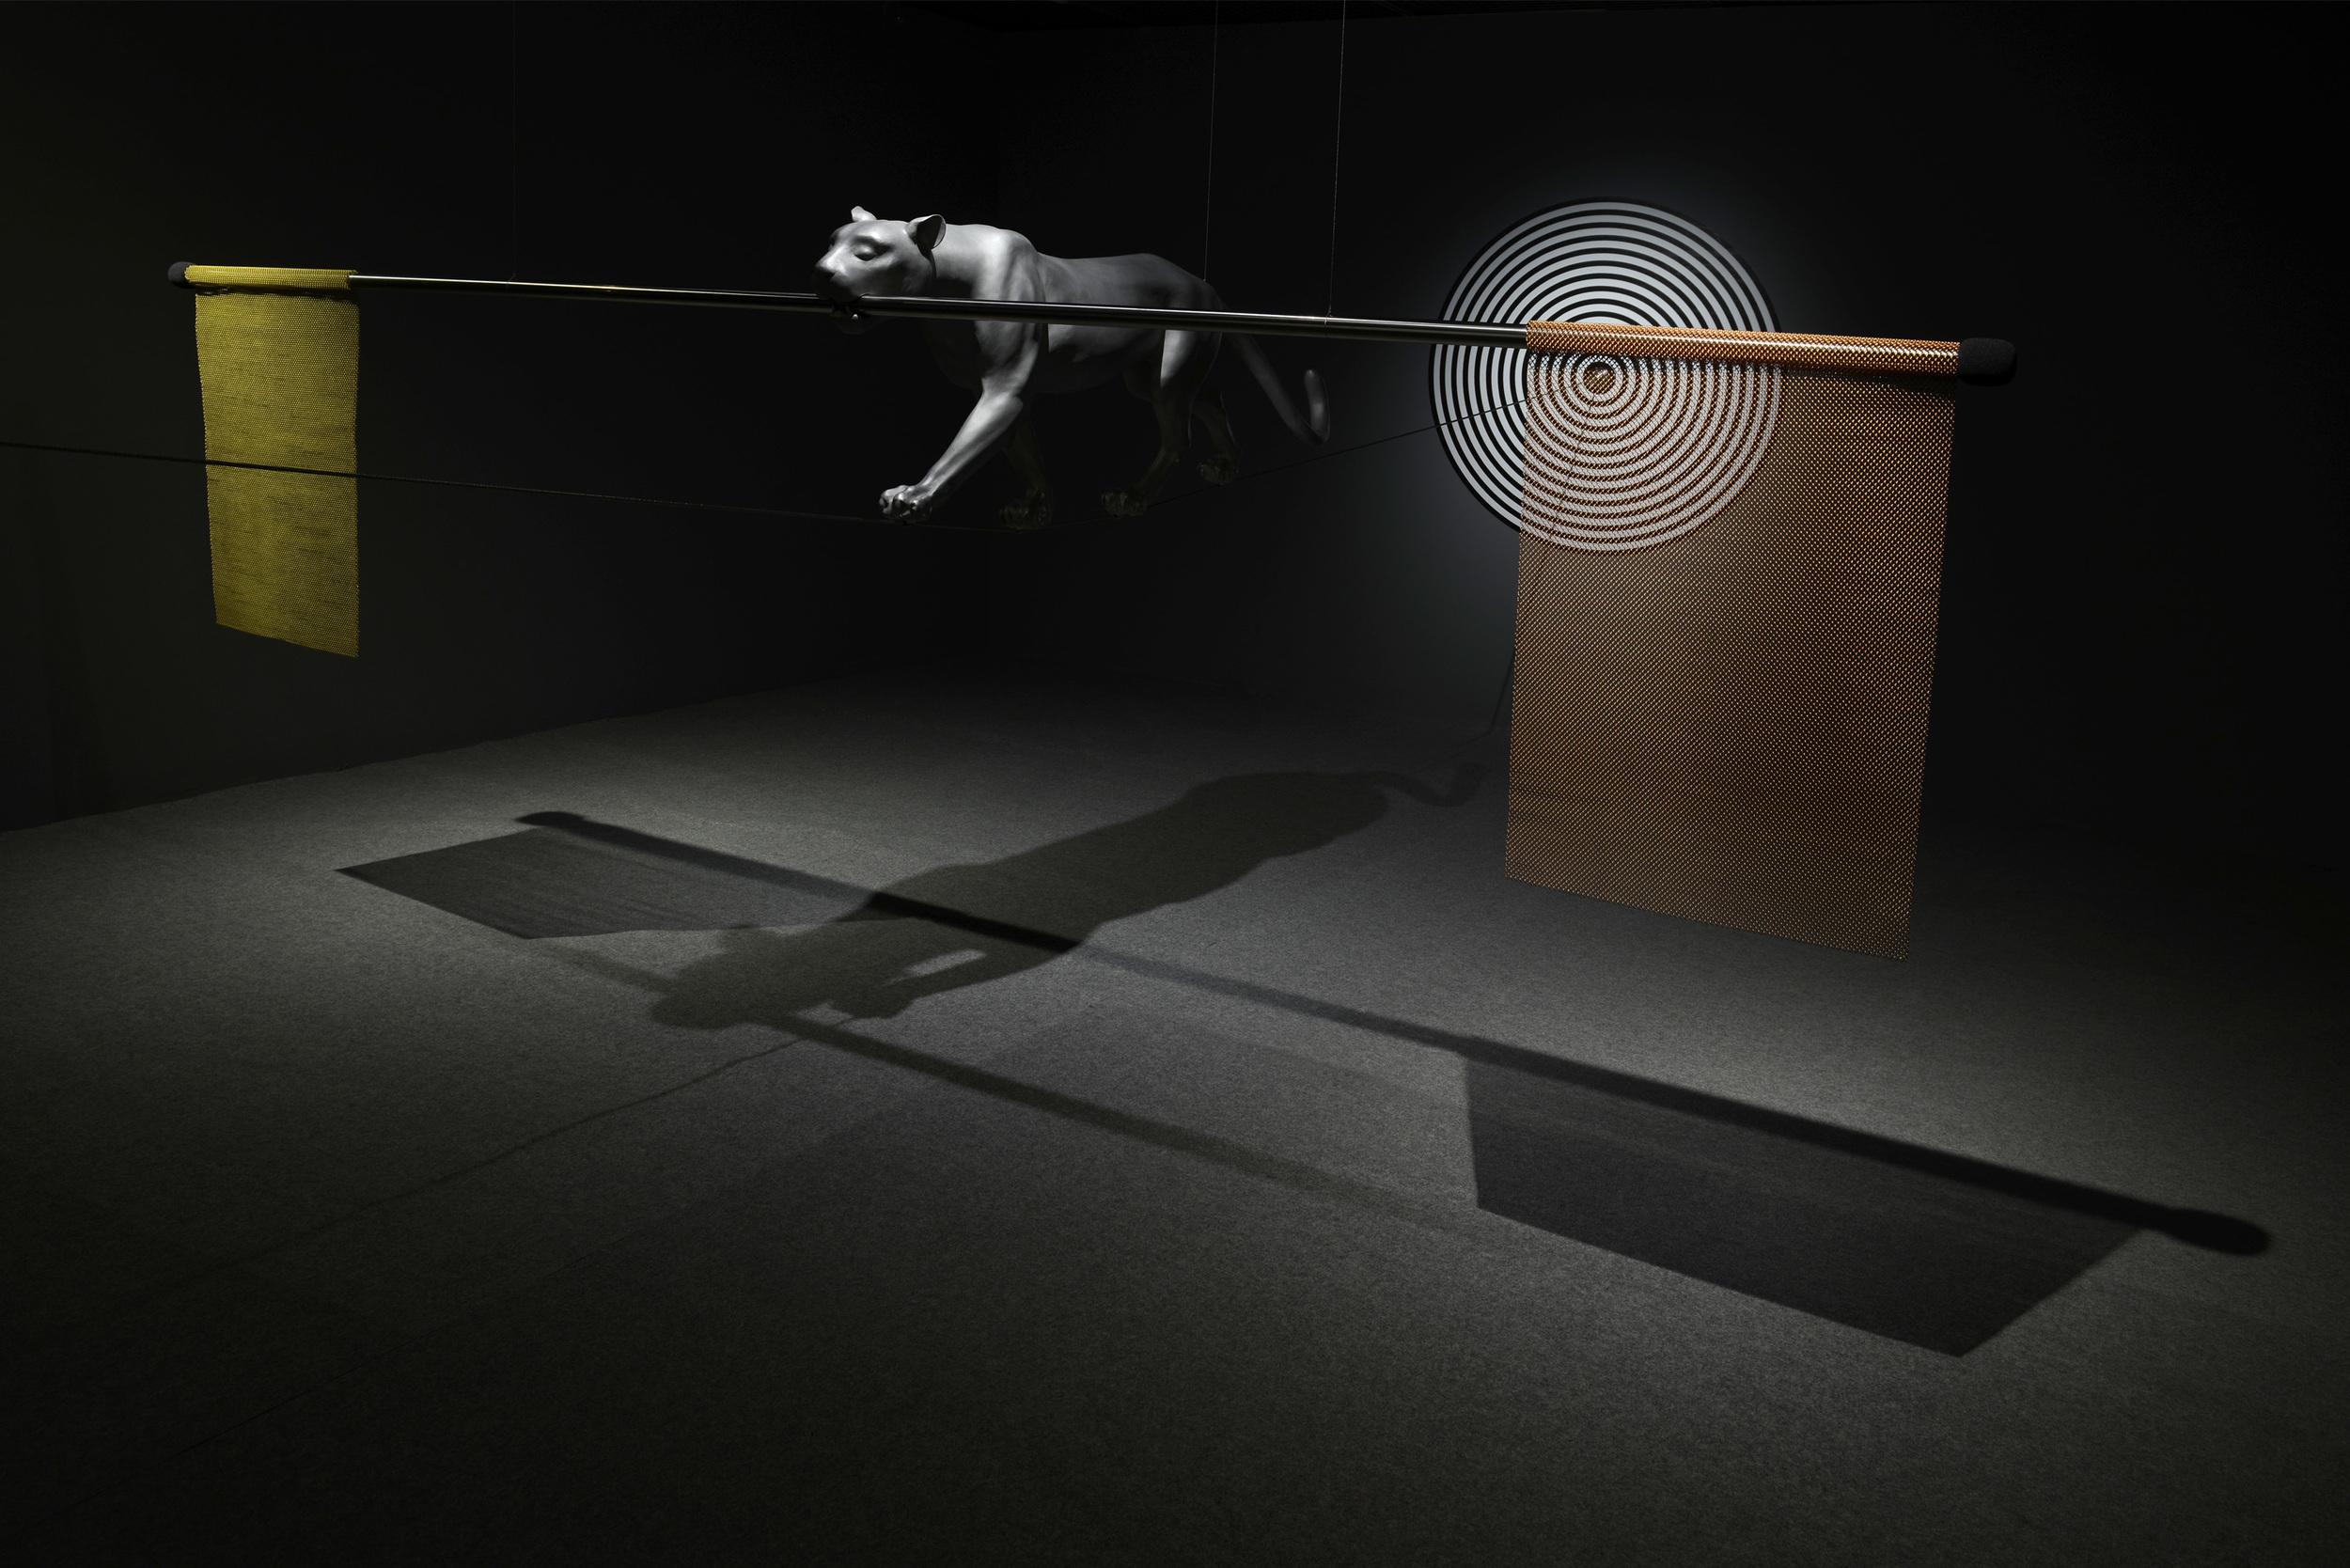 Gao Lei 高磊, ROOM-106, 2014, Mixed media installation 综合材料装置, Deminsions variable 尺寸可变